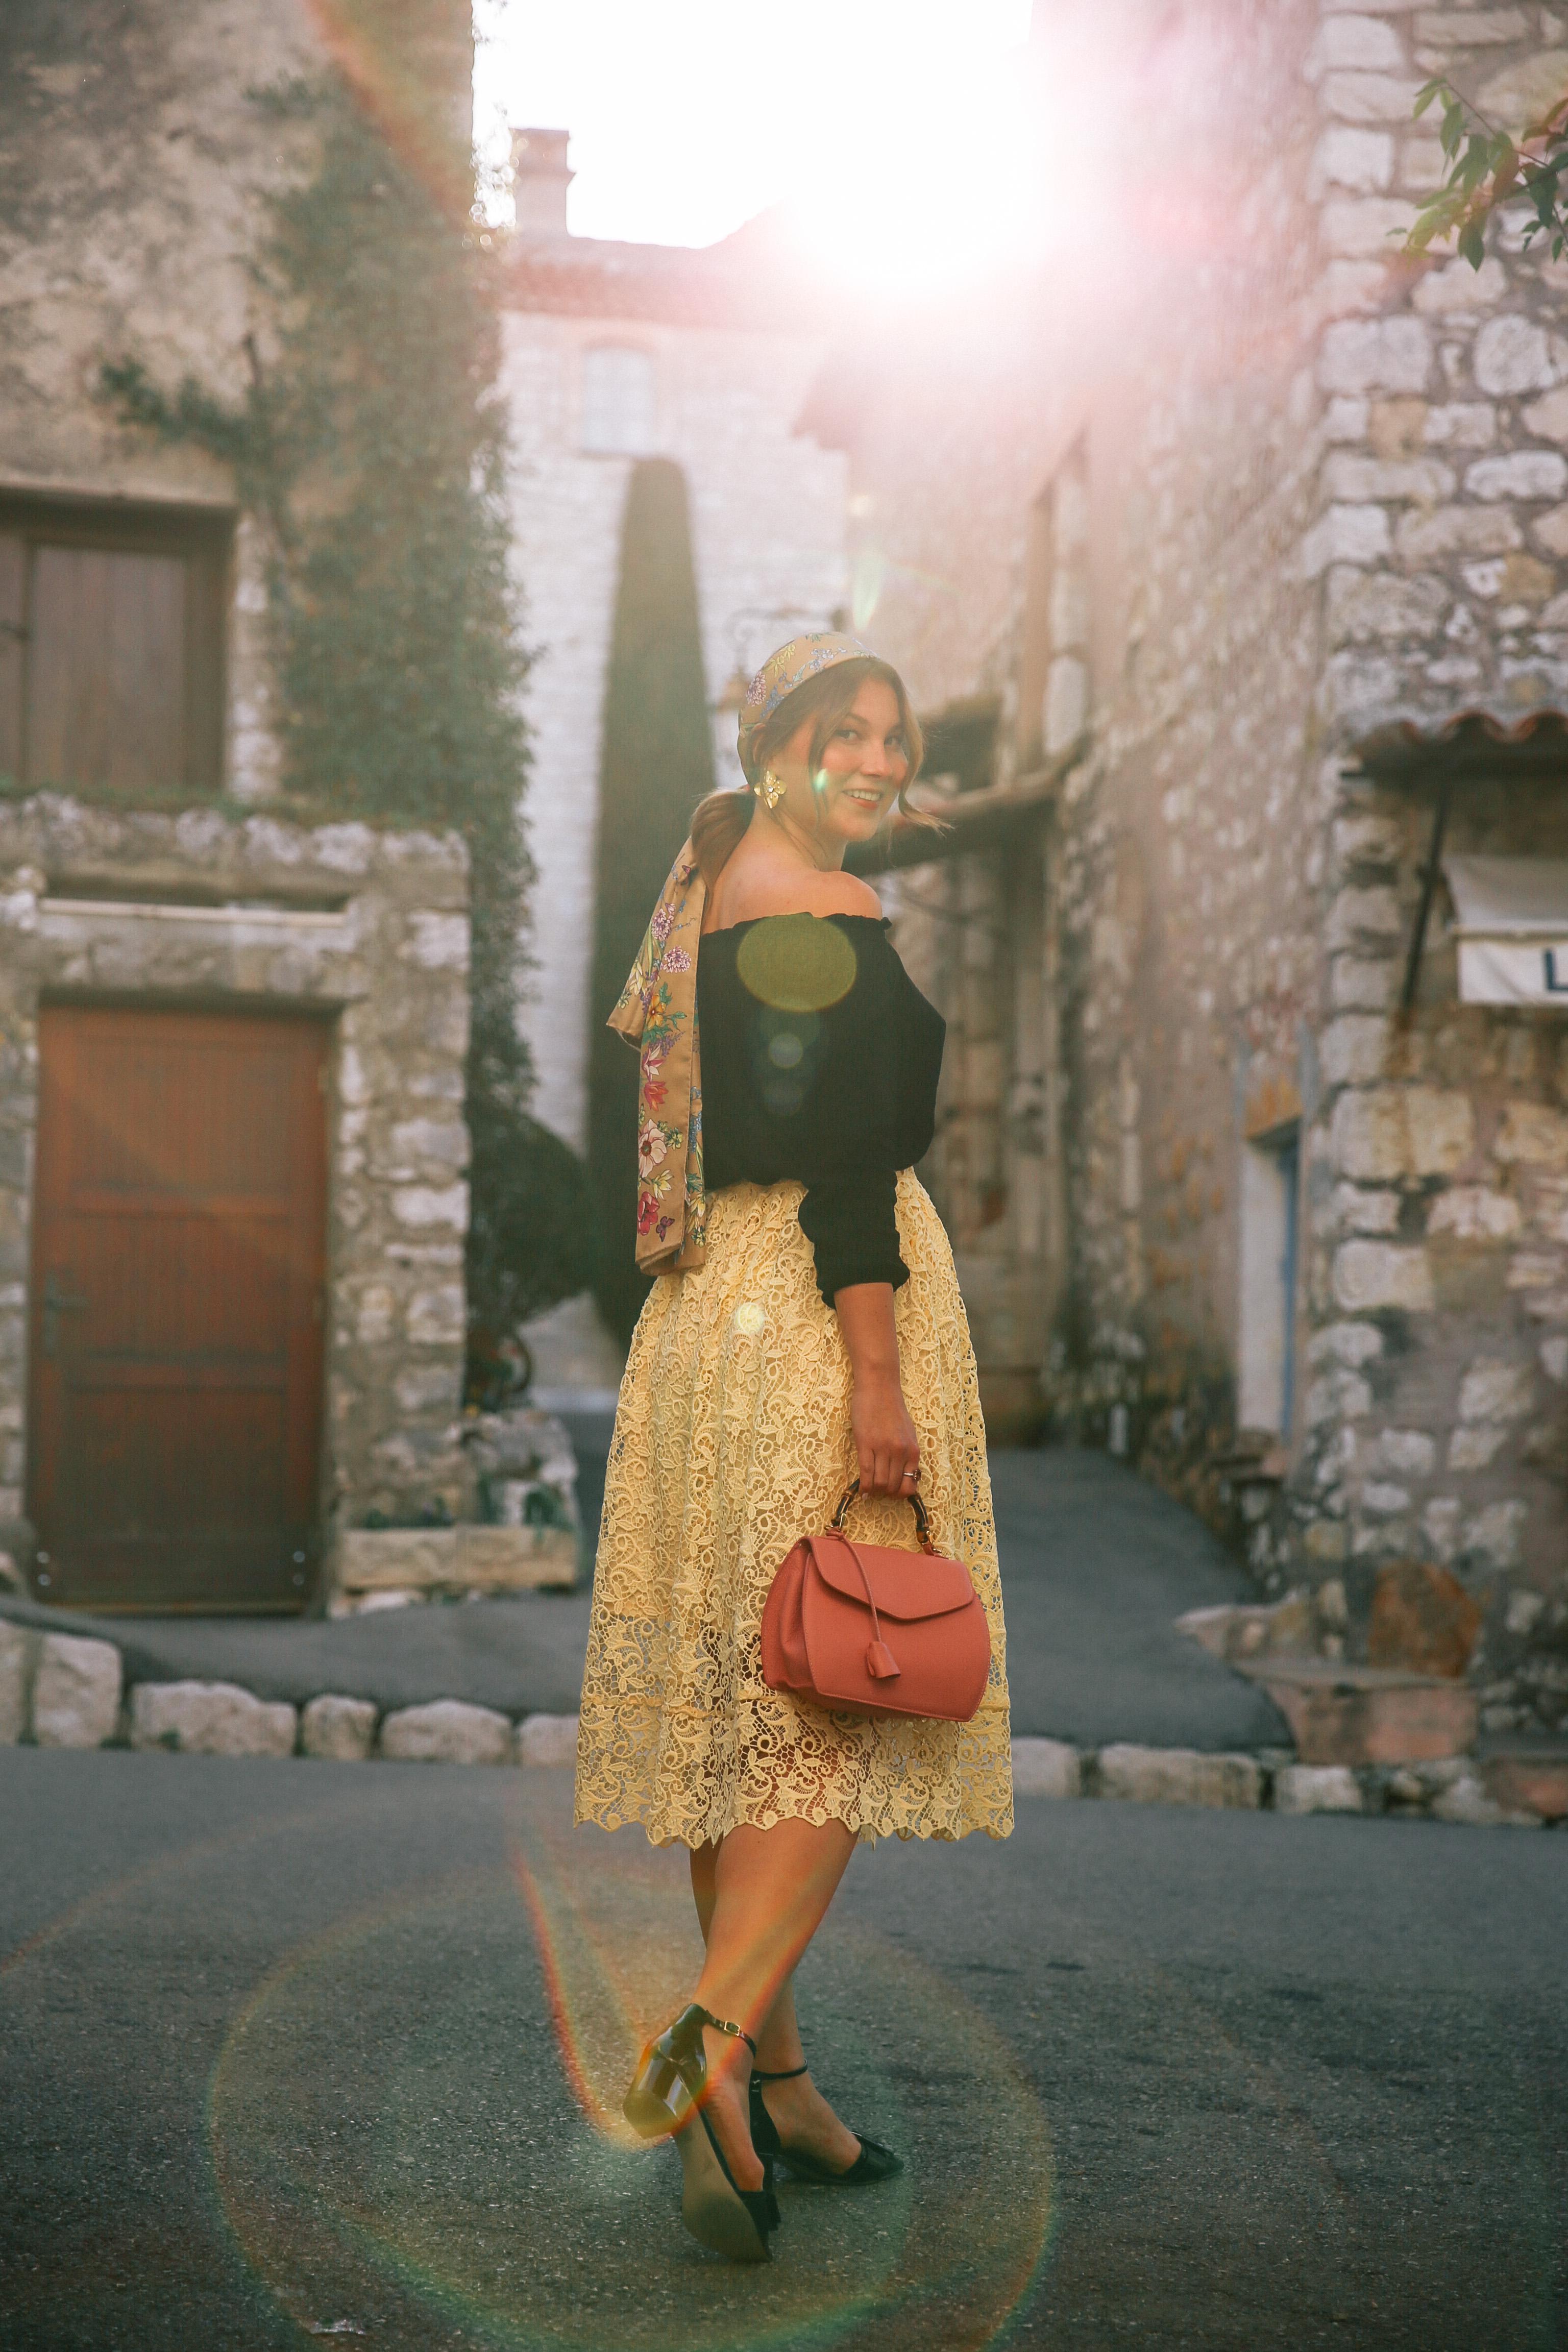 gourdon-provance-french-riviera-summer-style-vintage